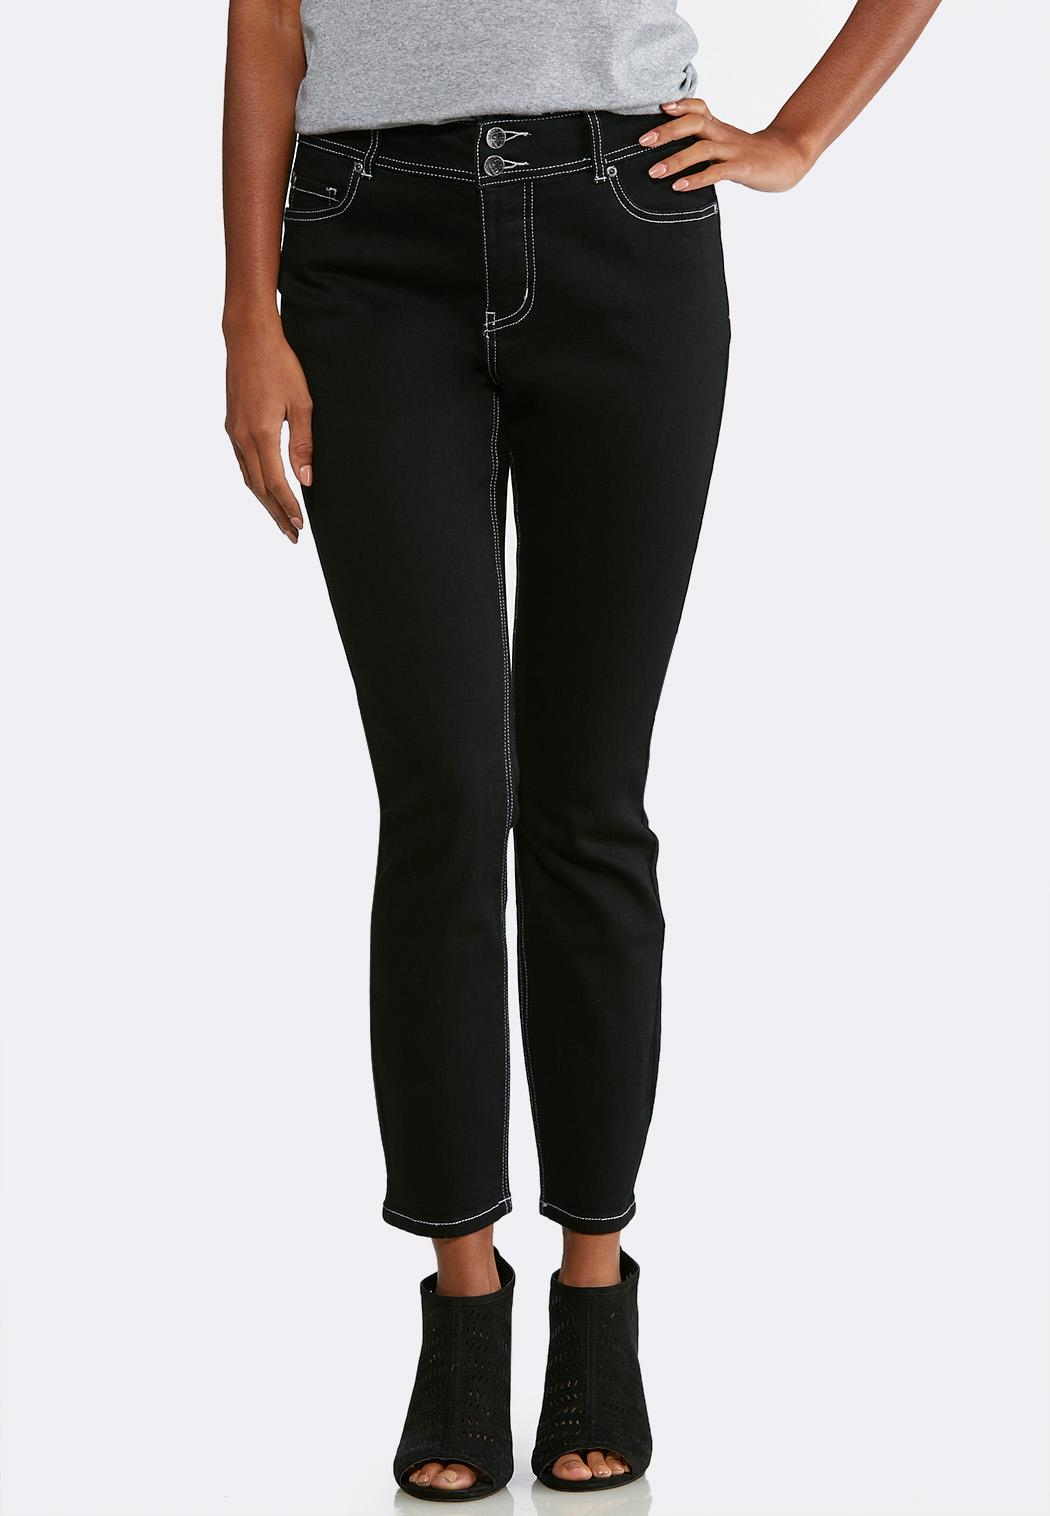 Black Wash Skinny Ankle Jeans